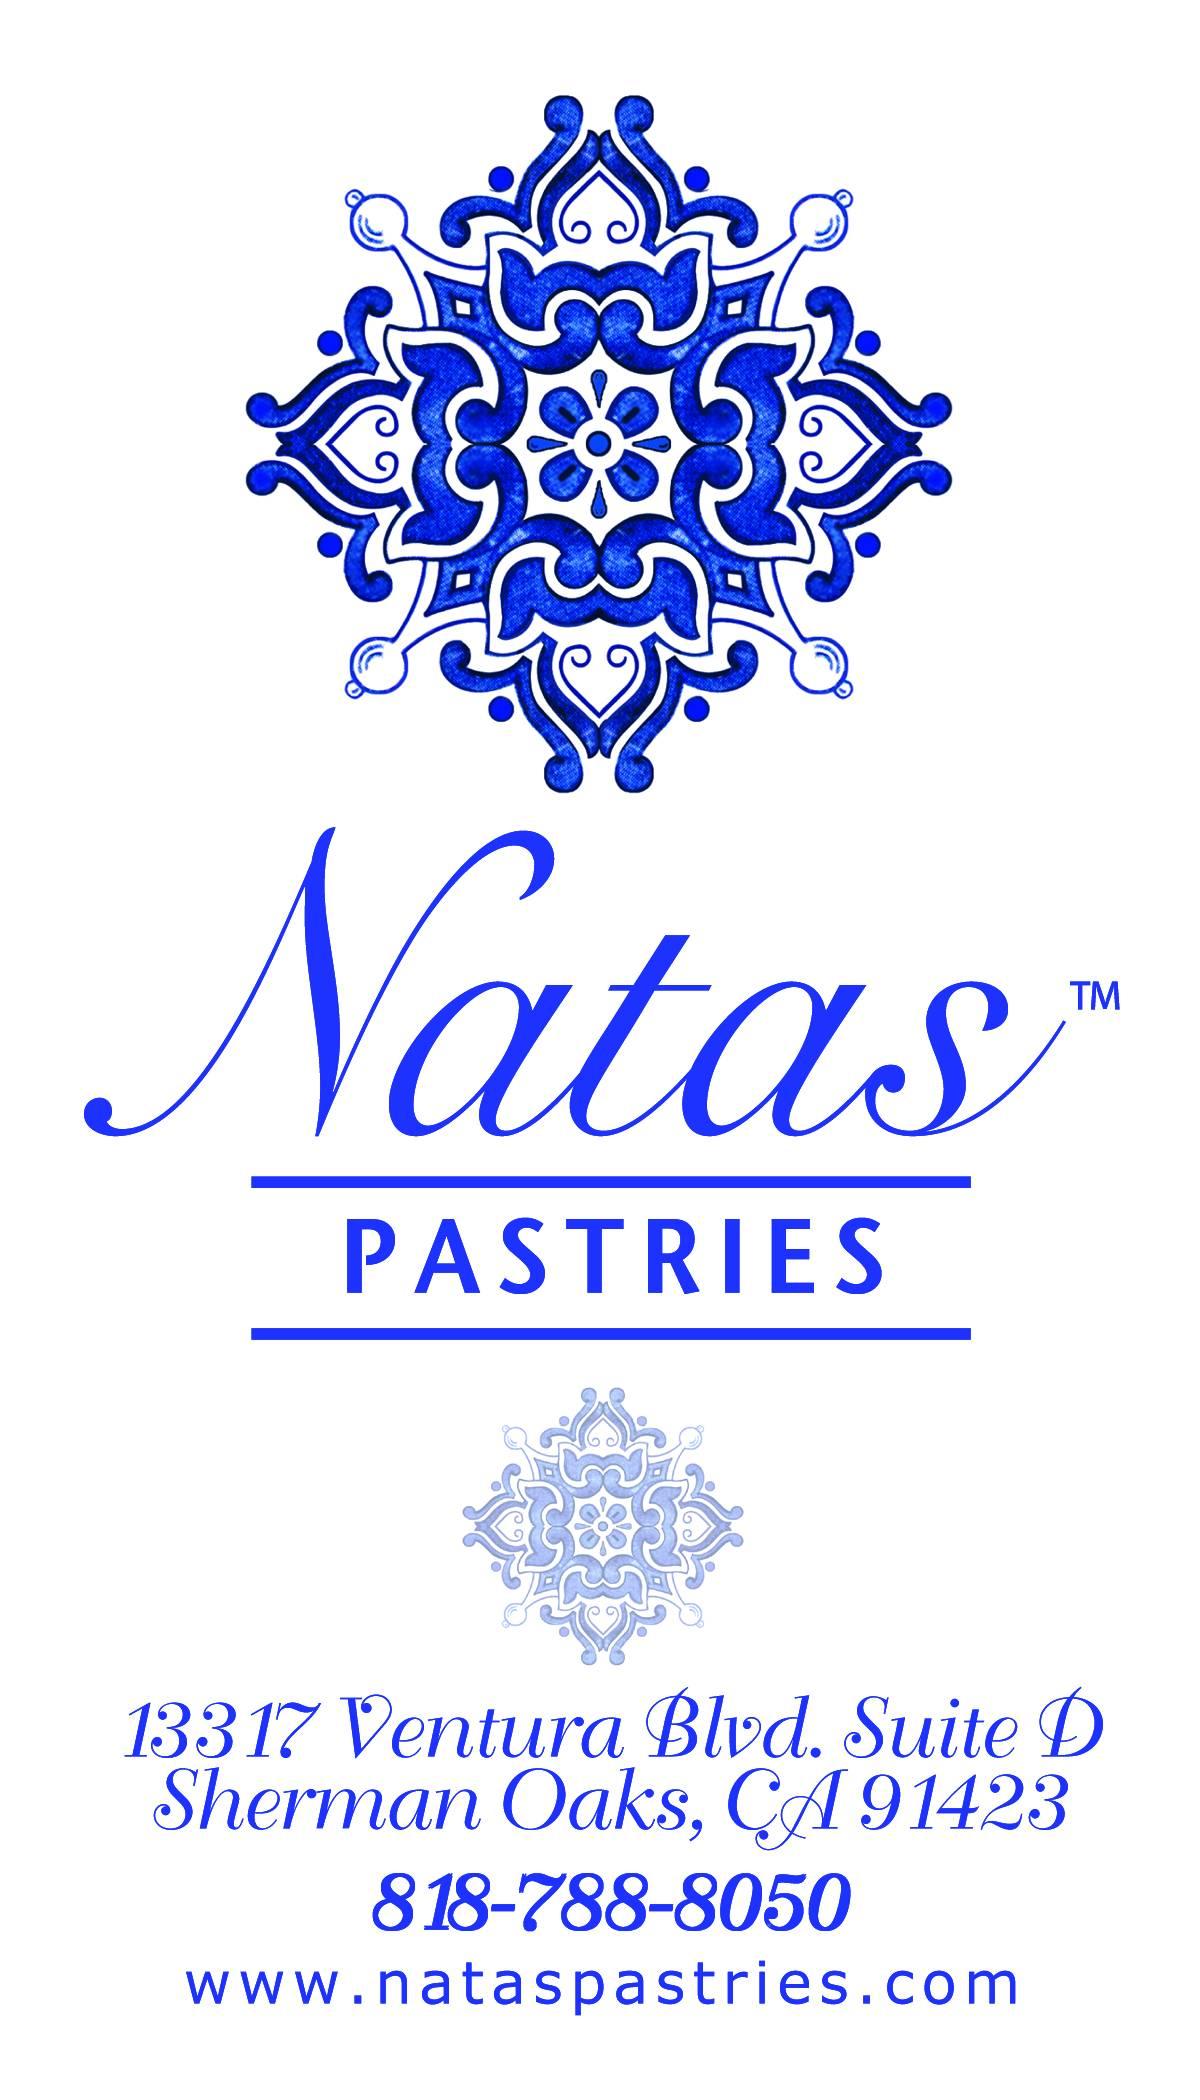 Natas Pastries Logo Exhibitors